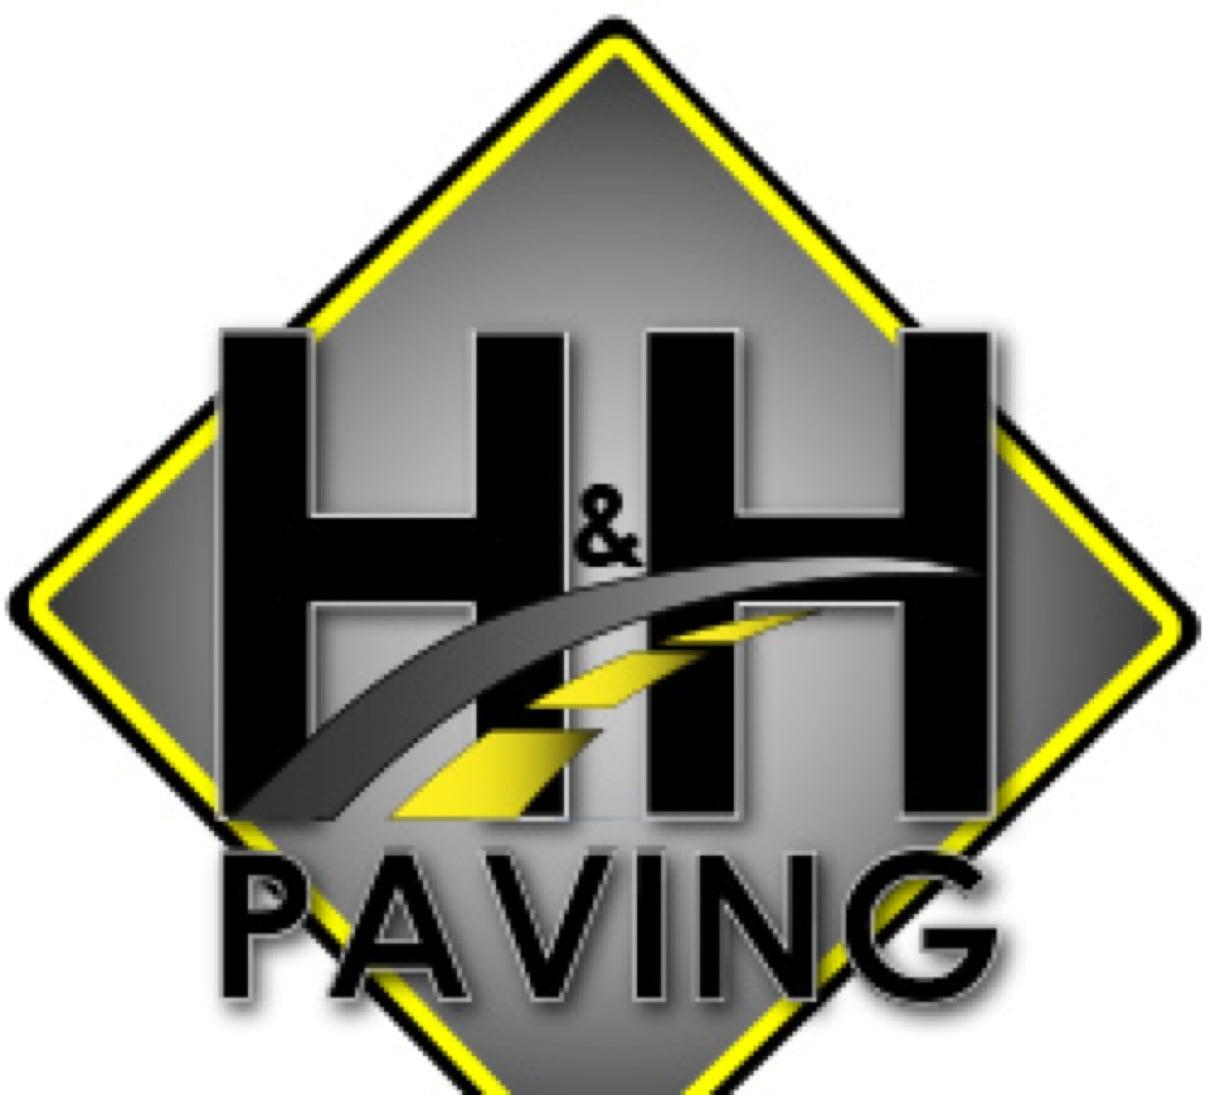 H & H Paving